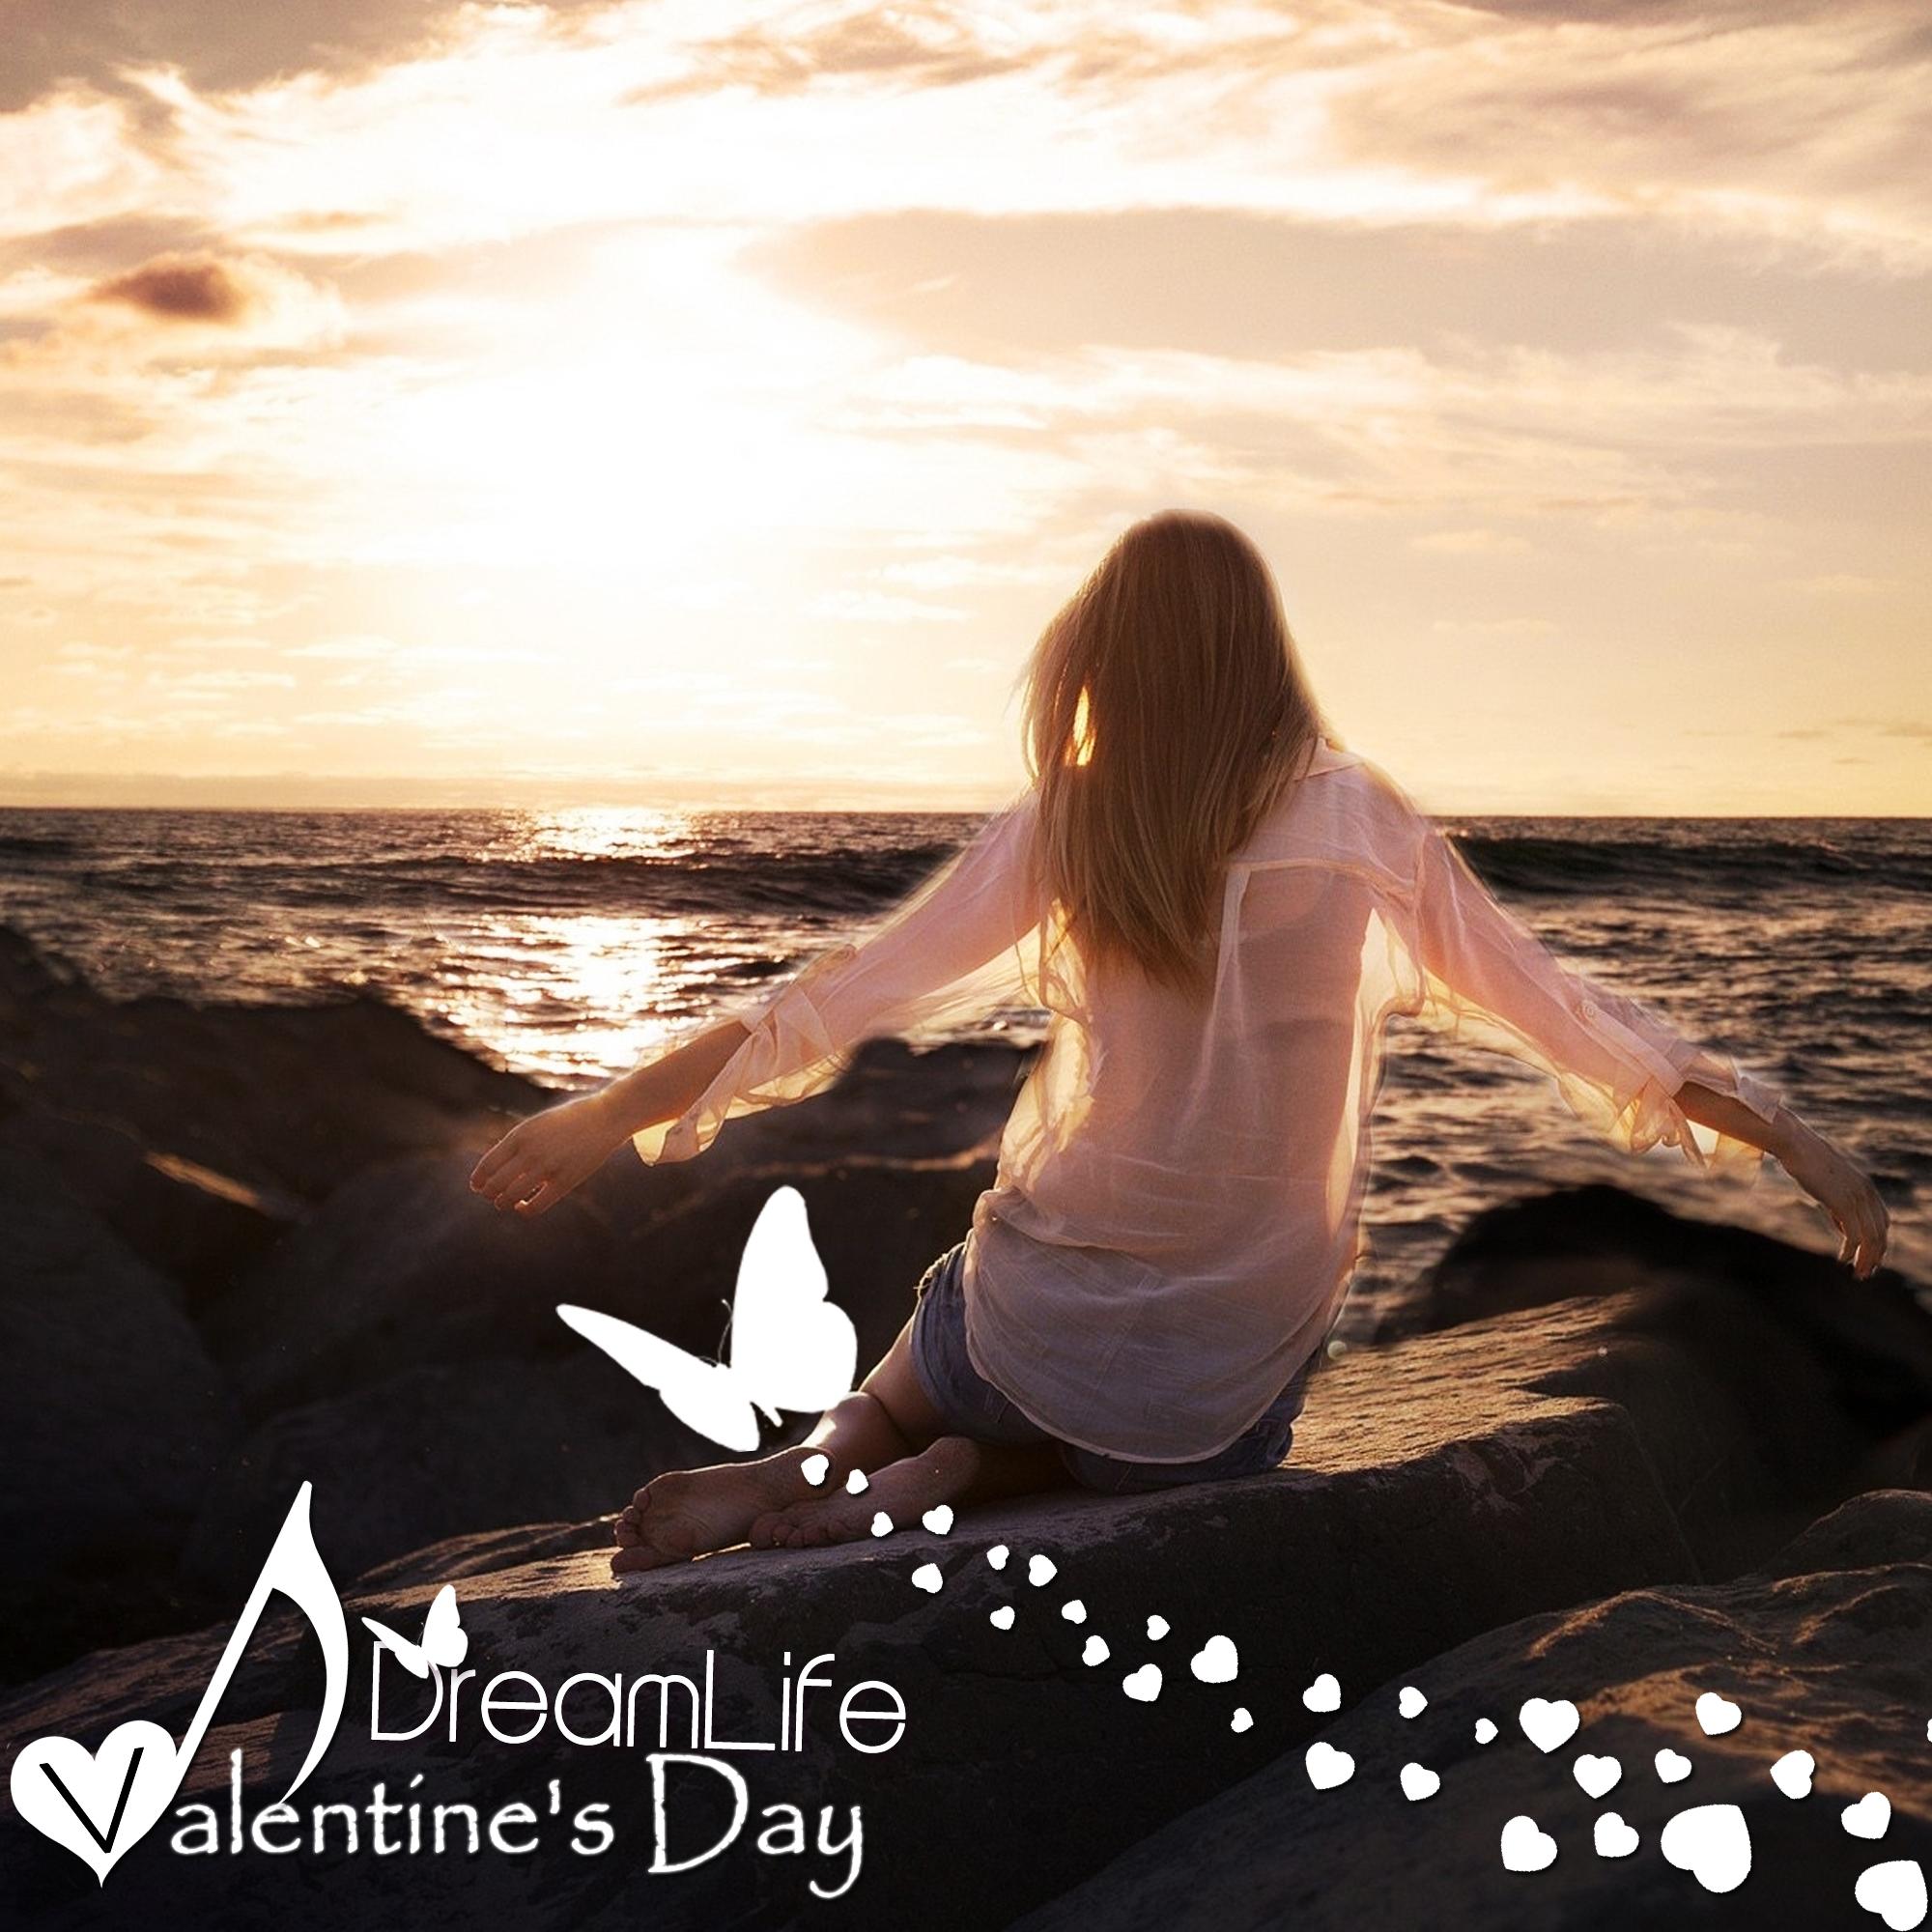 DreamLife – Valentine's Day (Original Mix)